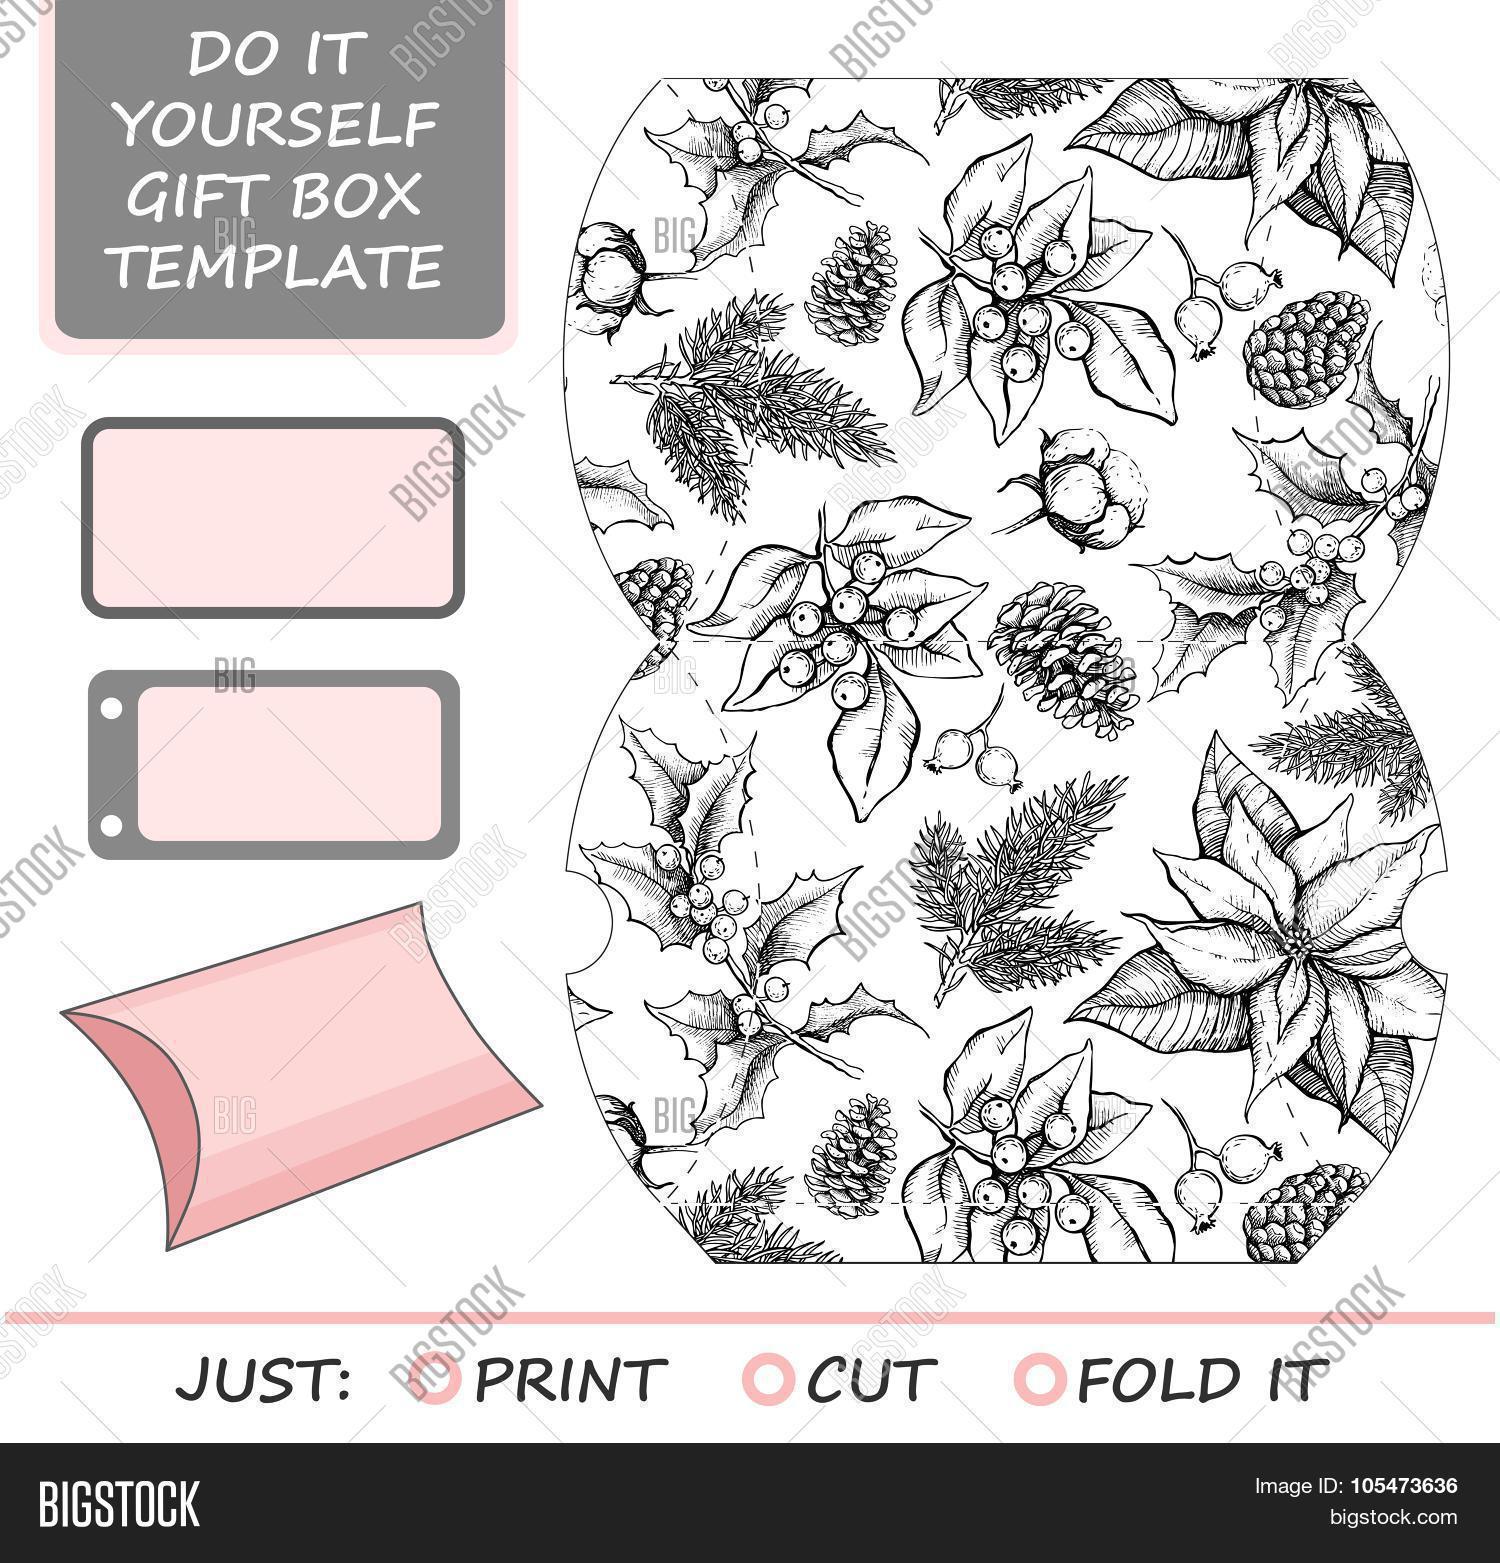 Favor gift box die cut box vector photo bigstock favor gift box die cut box template with winter floral pattern solutioingenieria Images